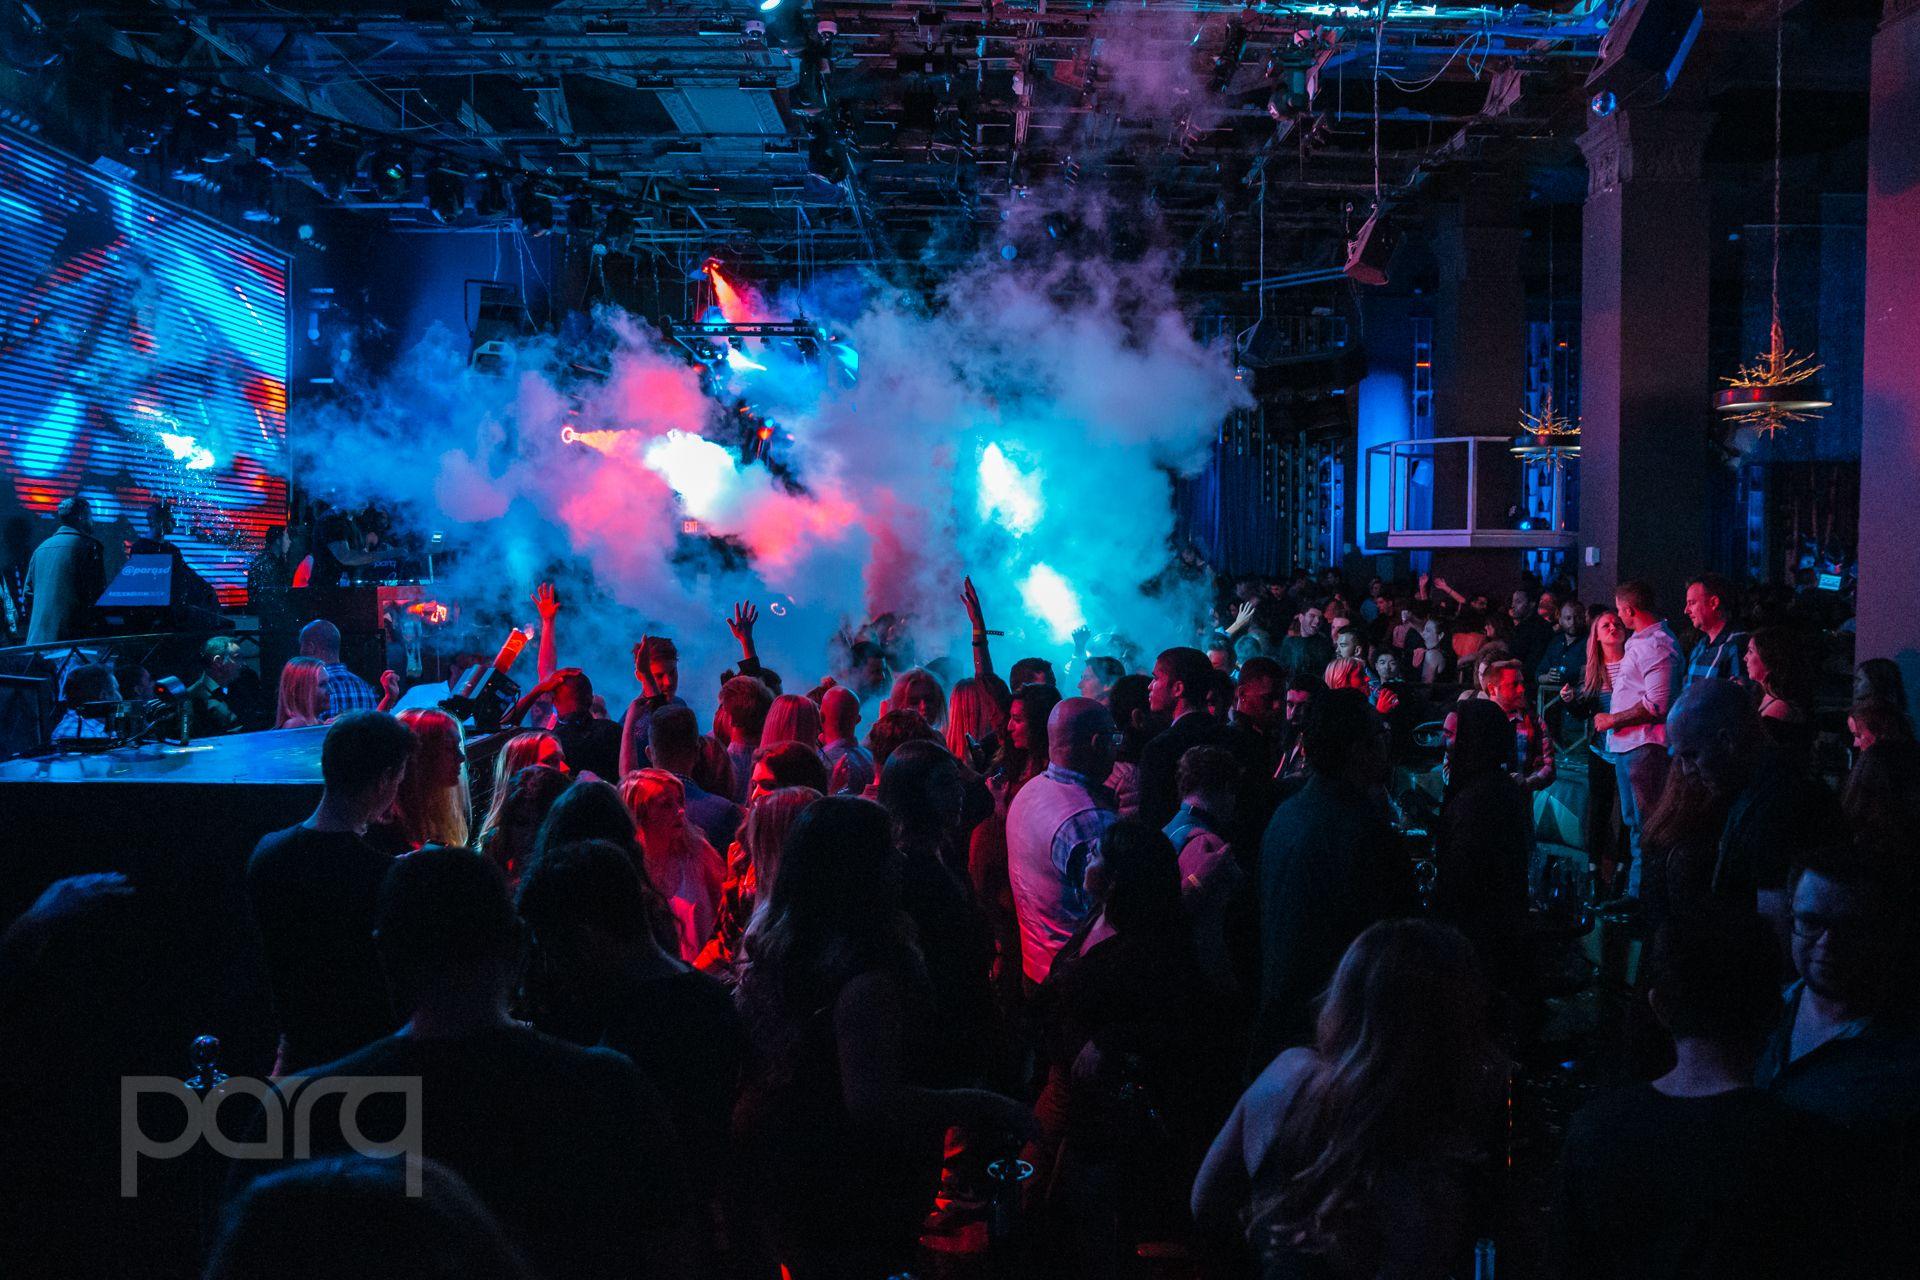 01.19.18 Parq - DJ Hollywood-20.jpg